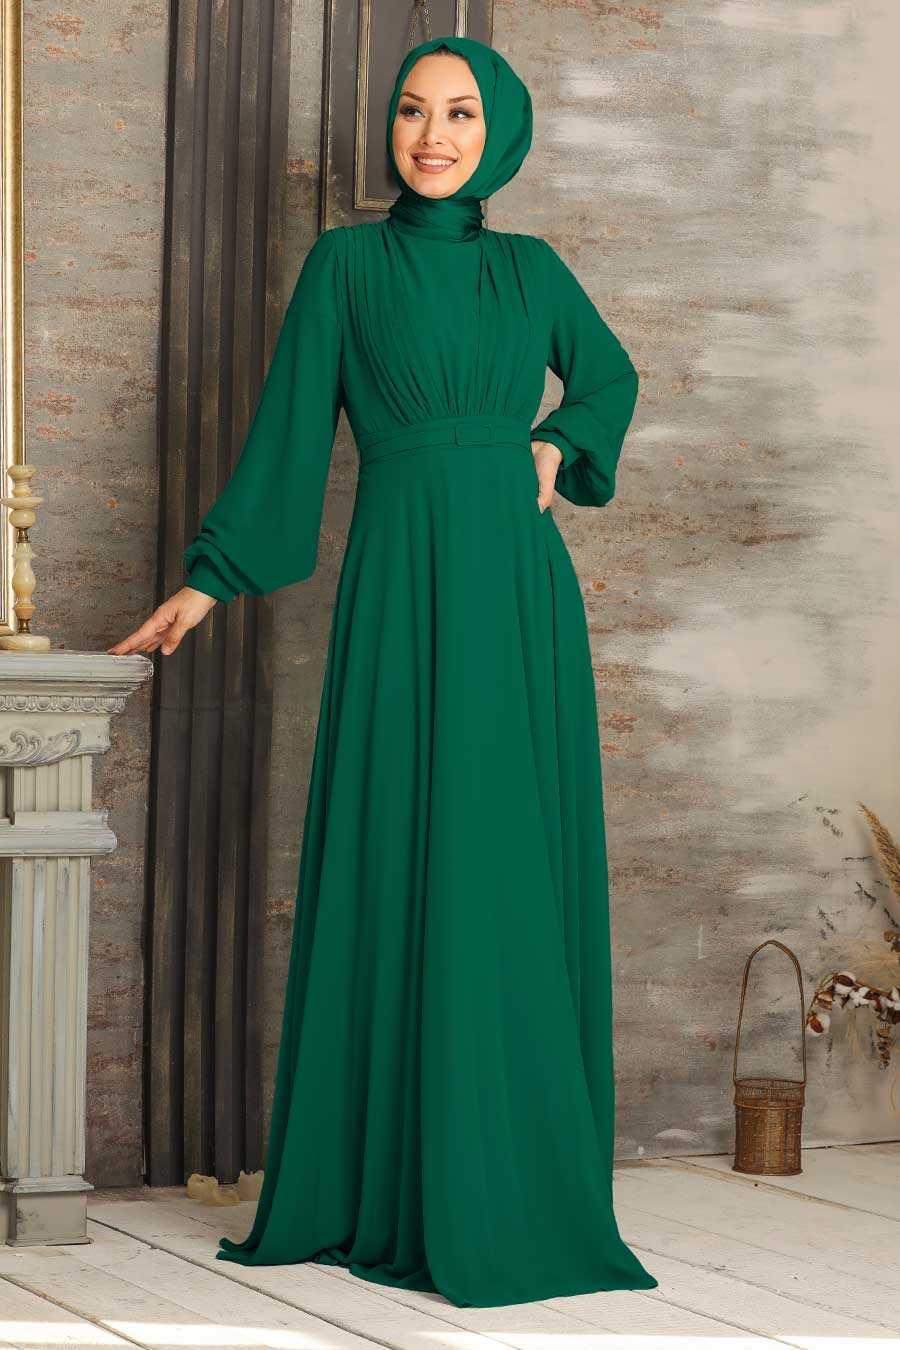 Green Hijab Evening Dress 5422Y